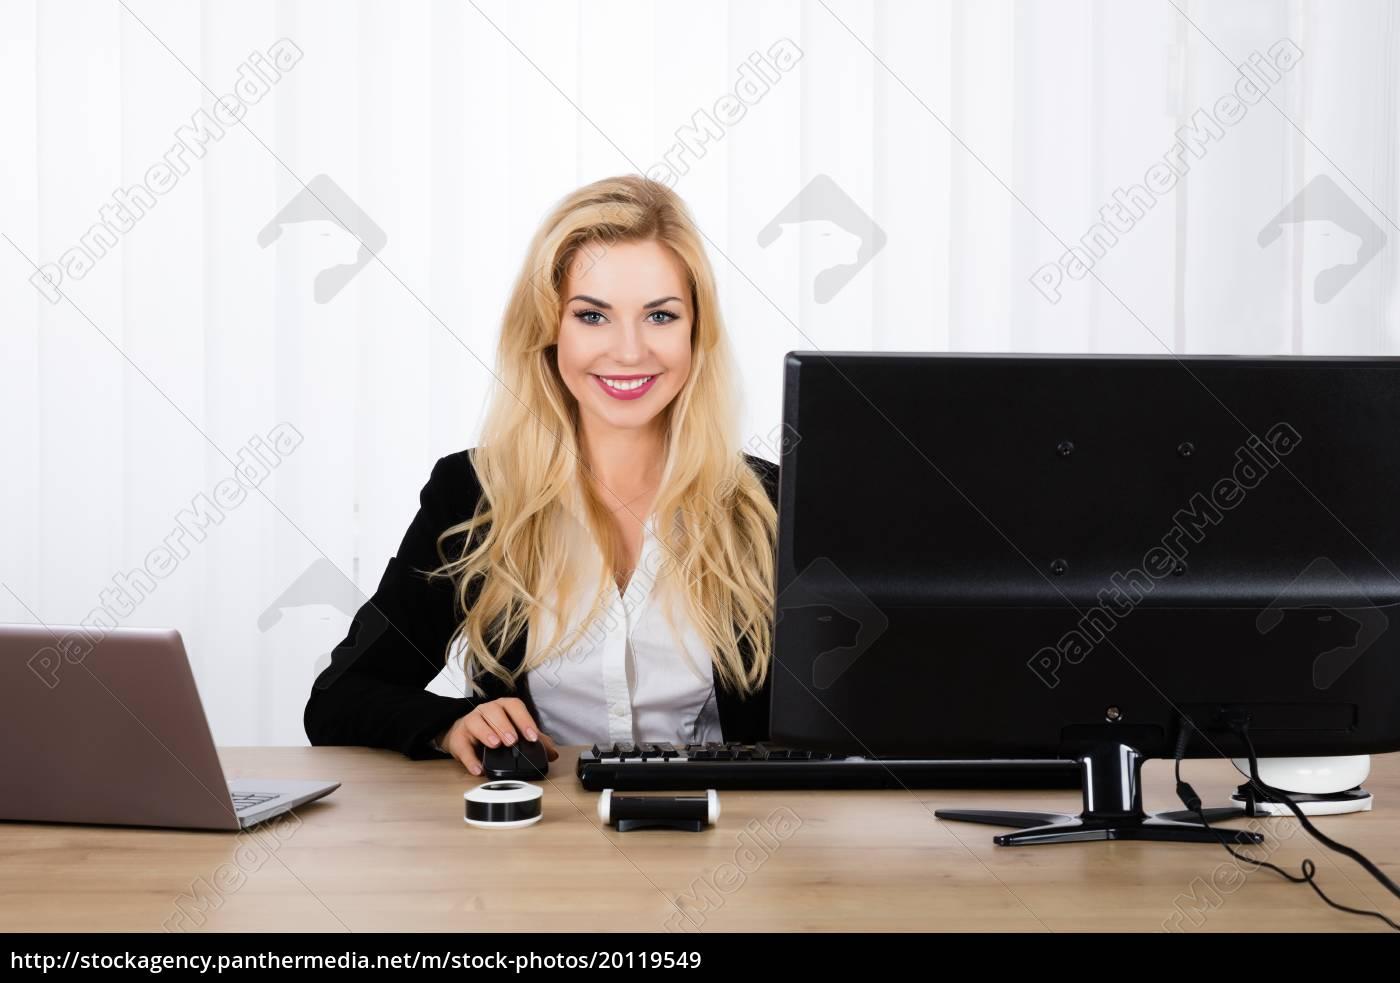 woman, sitting, on, office, desk - 20119549